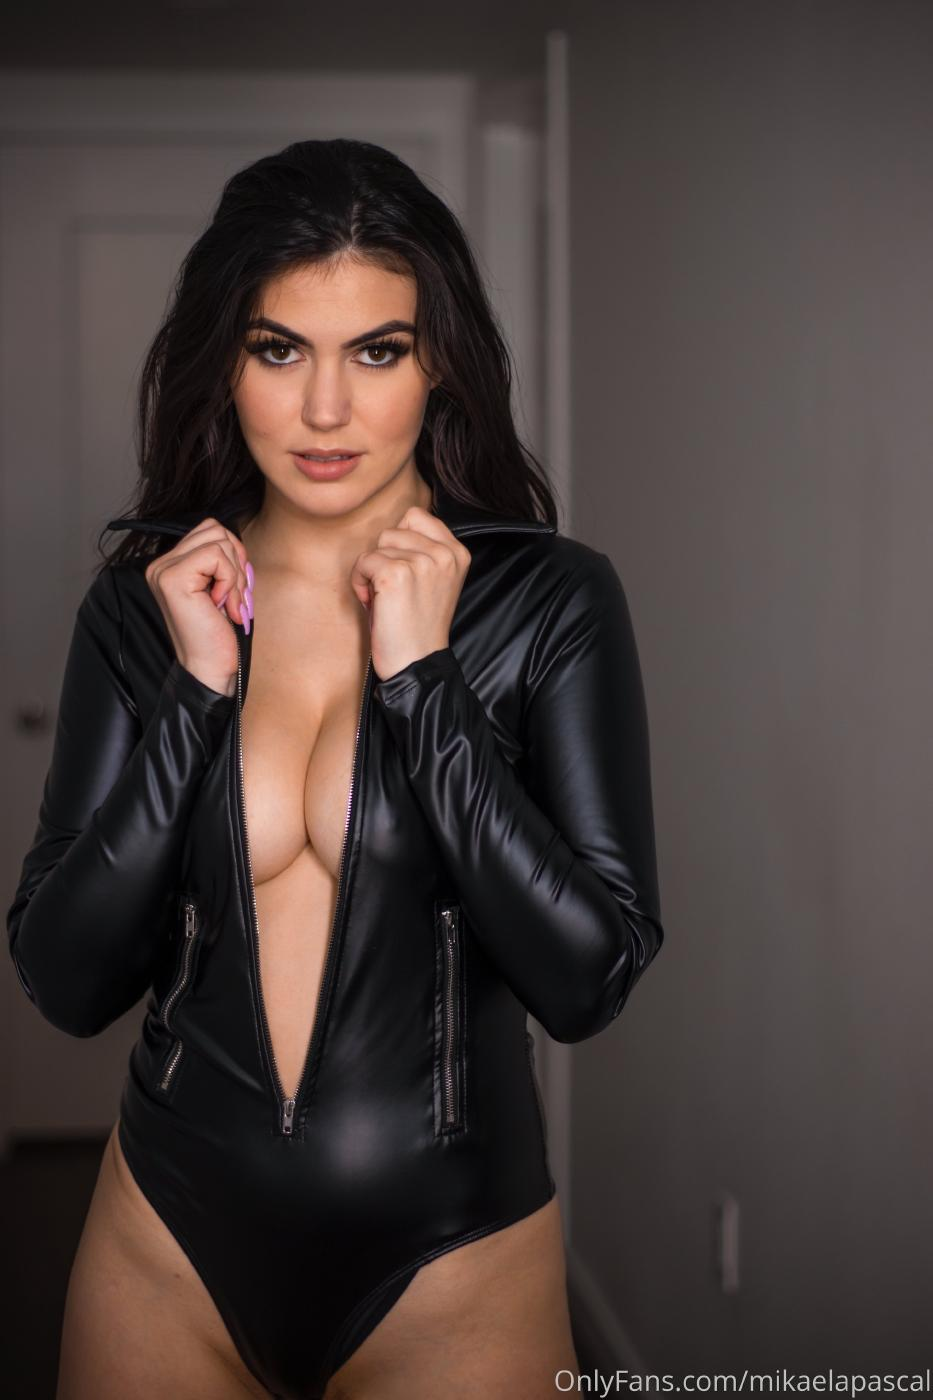 Mikaela Pascal Sexy Leather Bodysuit Onlyfans Set Leaked 0022